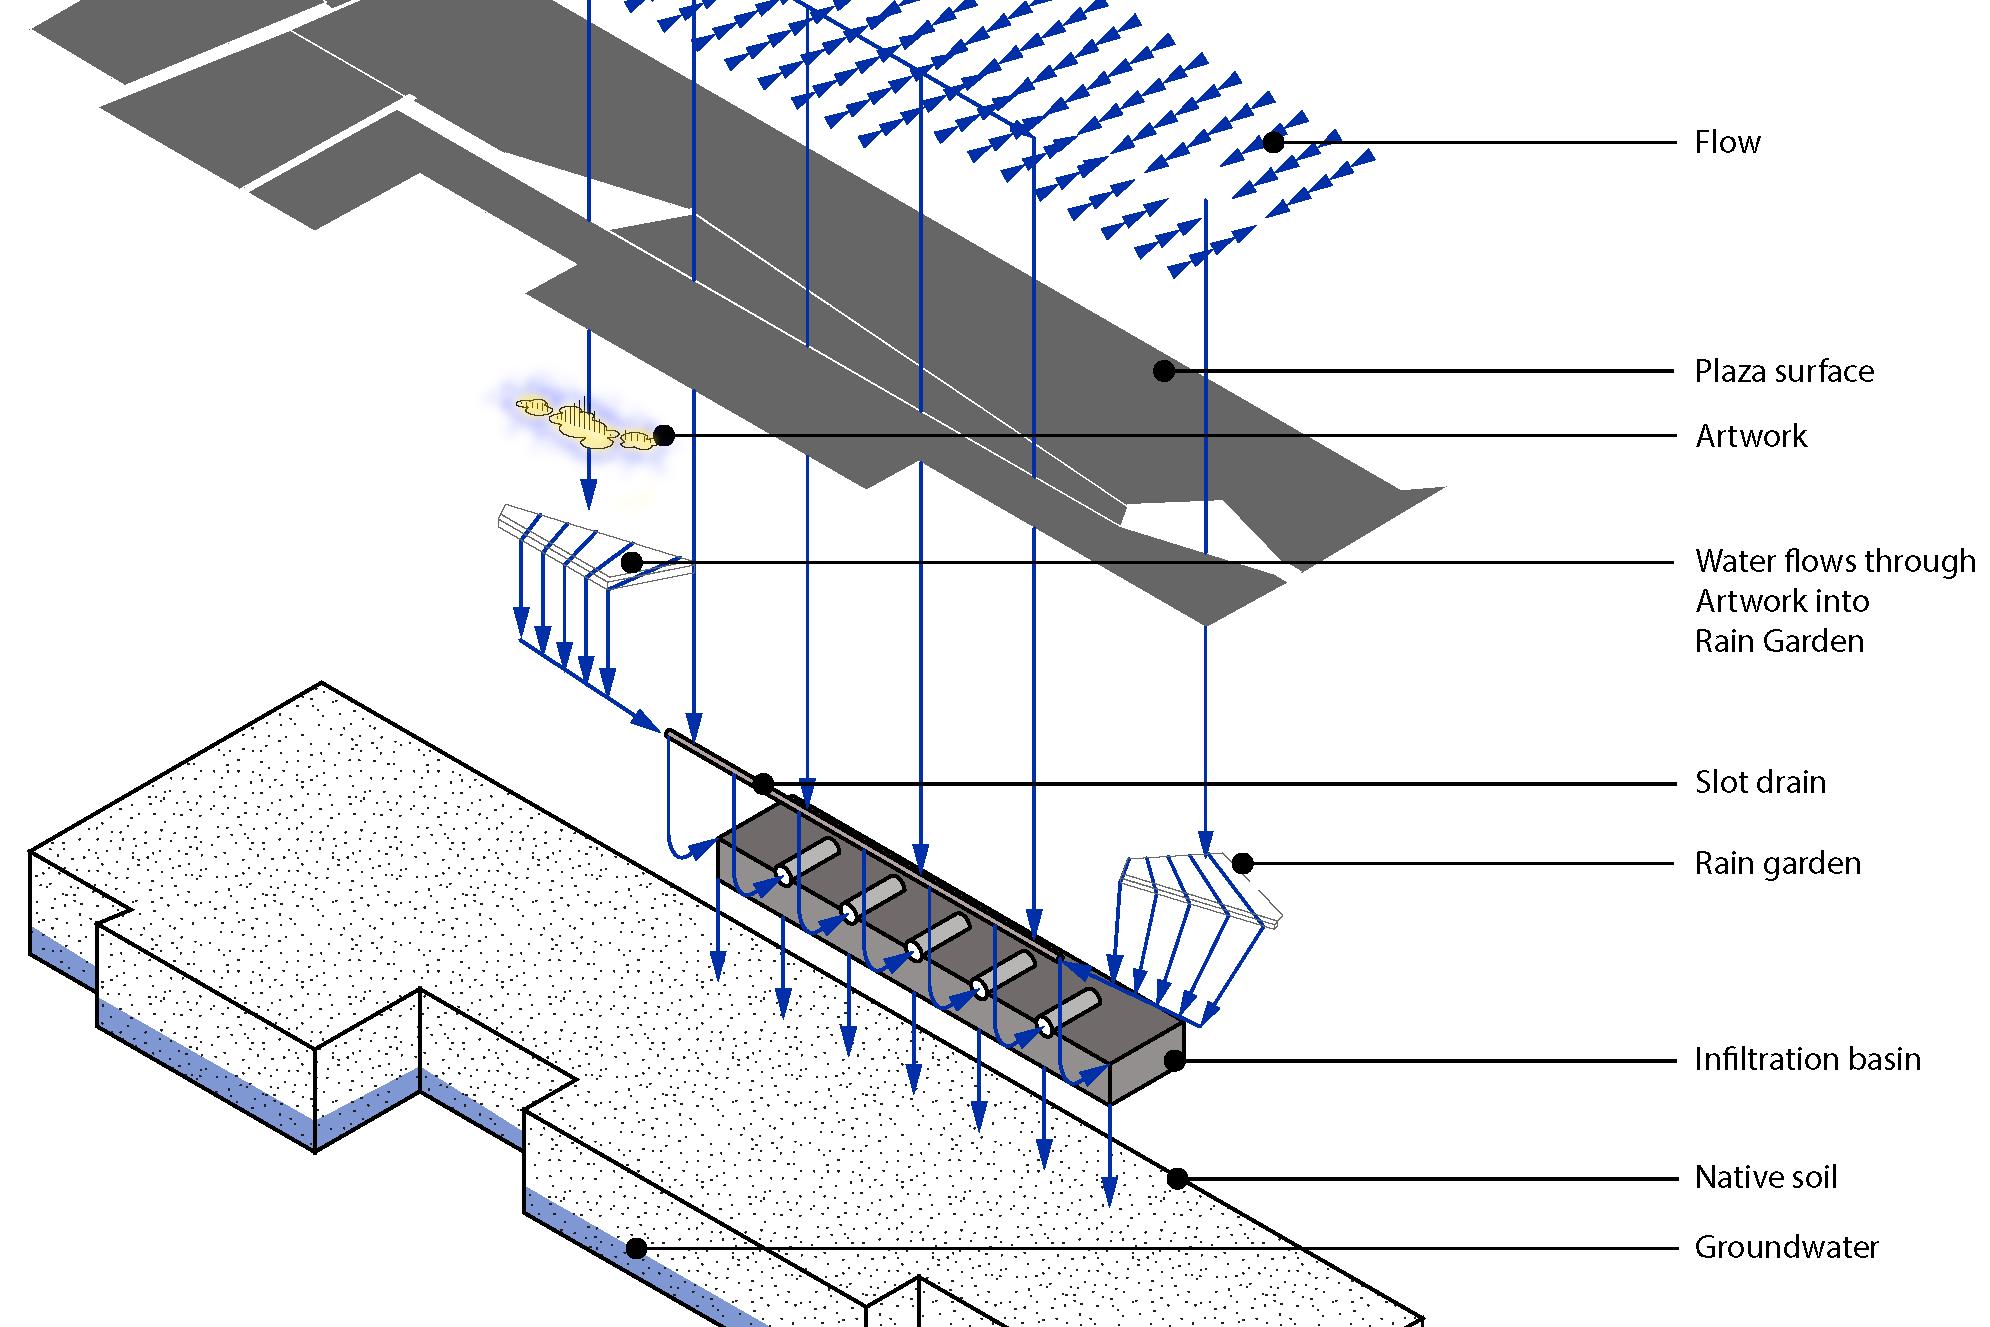 18091CMG Future Cities lab Water garen Mirage Diagram_Final.png